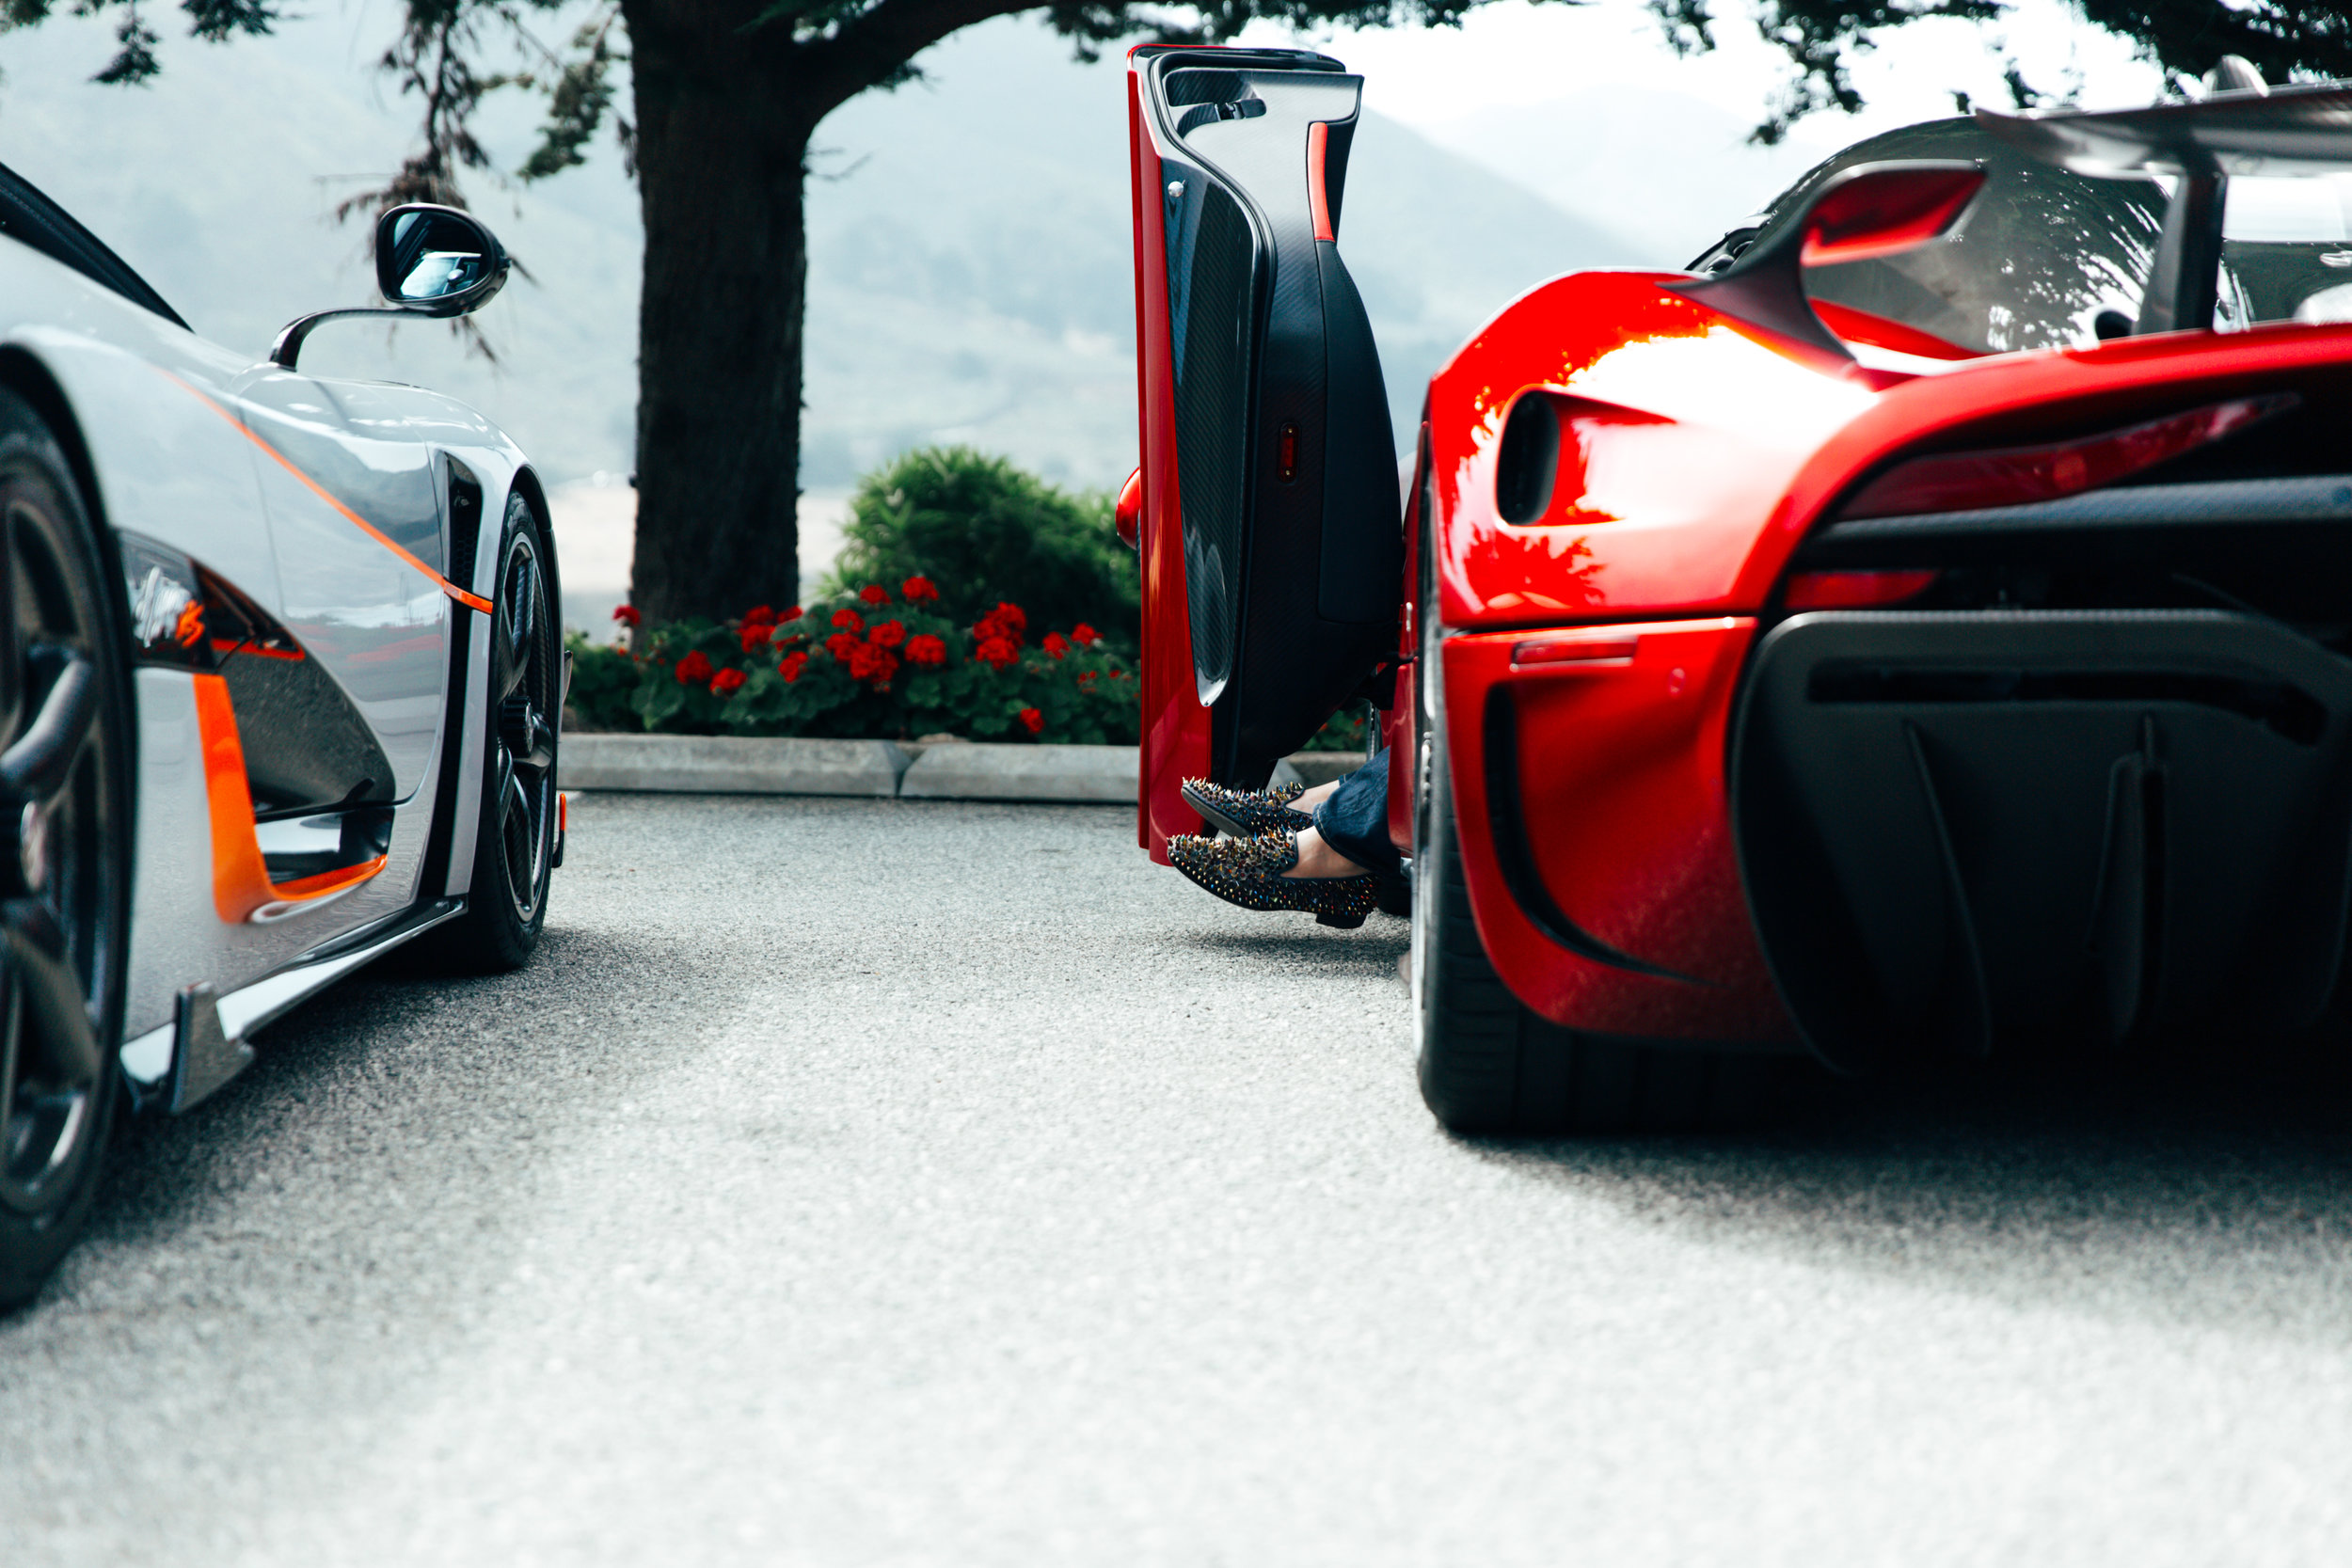 Stay_Driven_Monterey_Car_Week_Koenigsegg-37.jpg